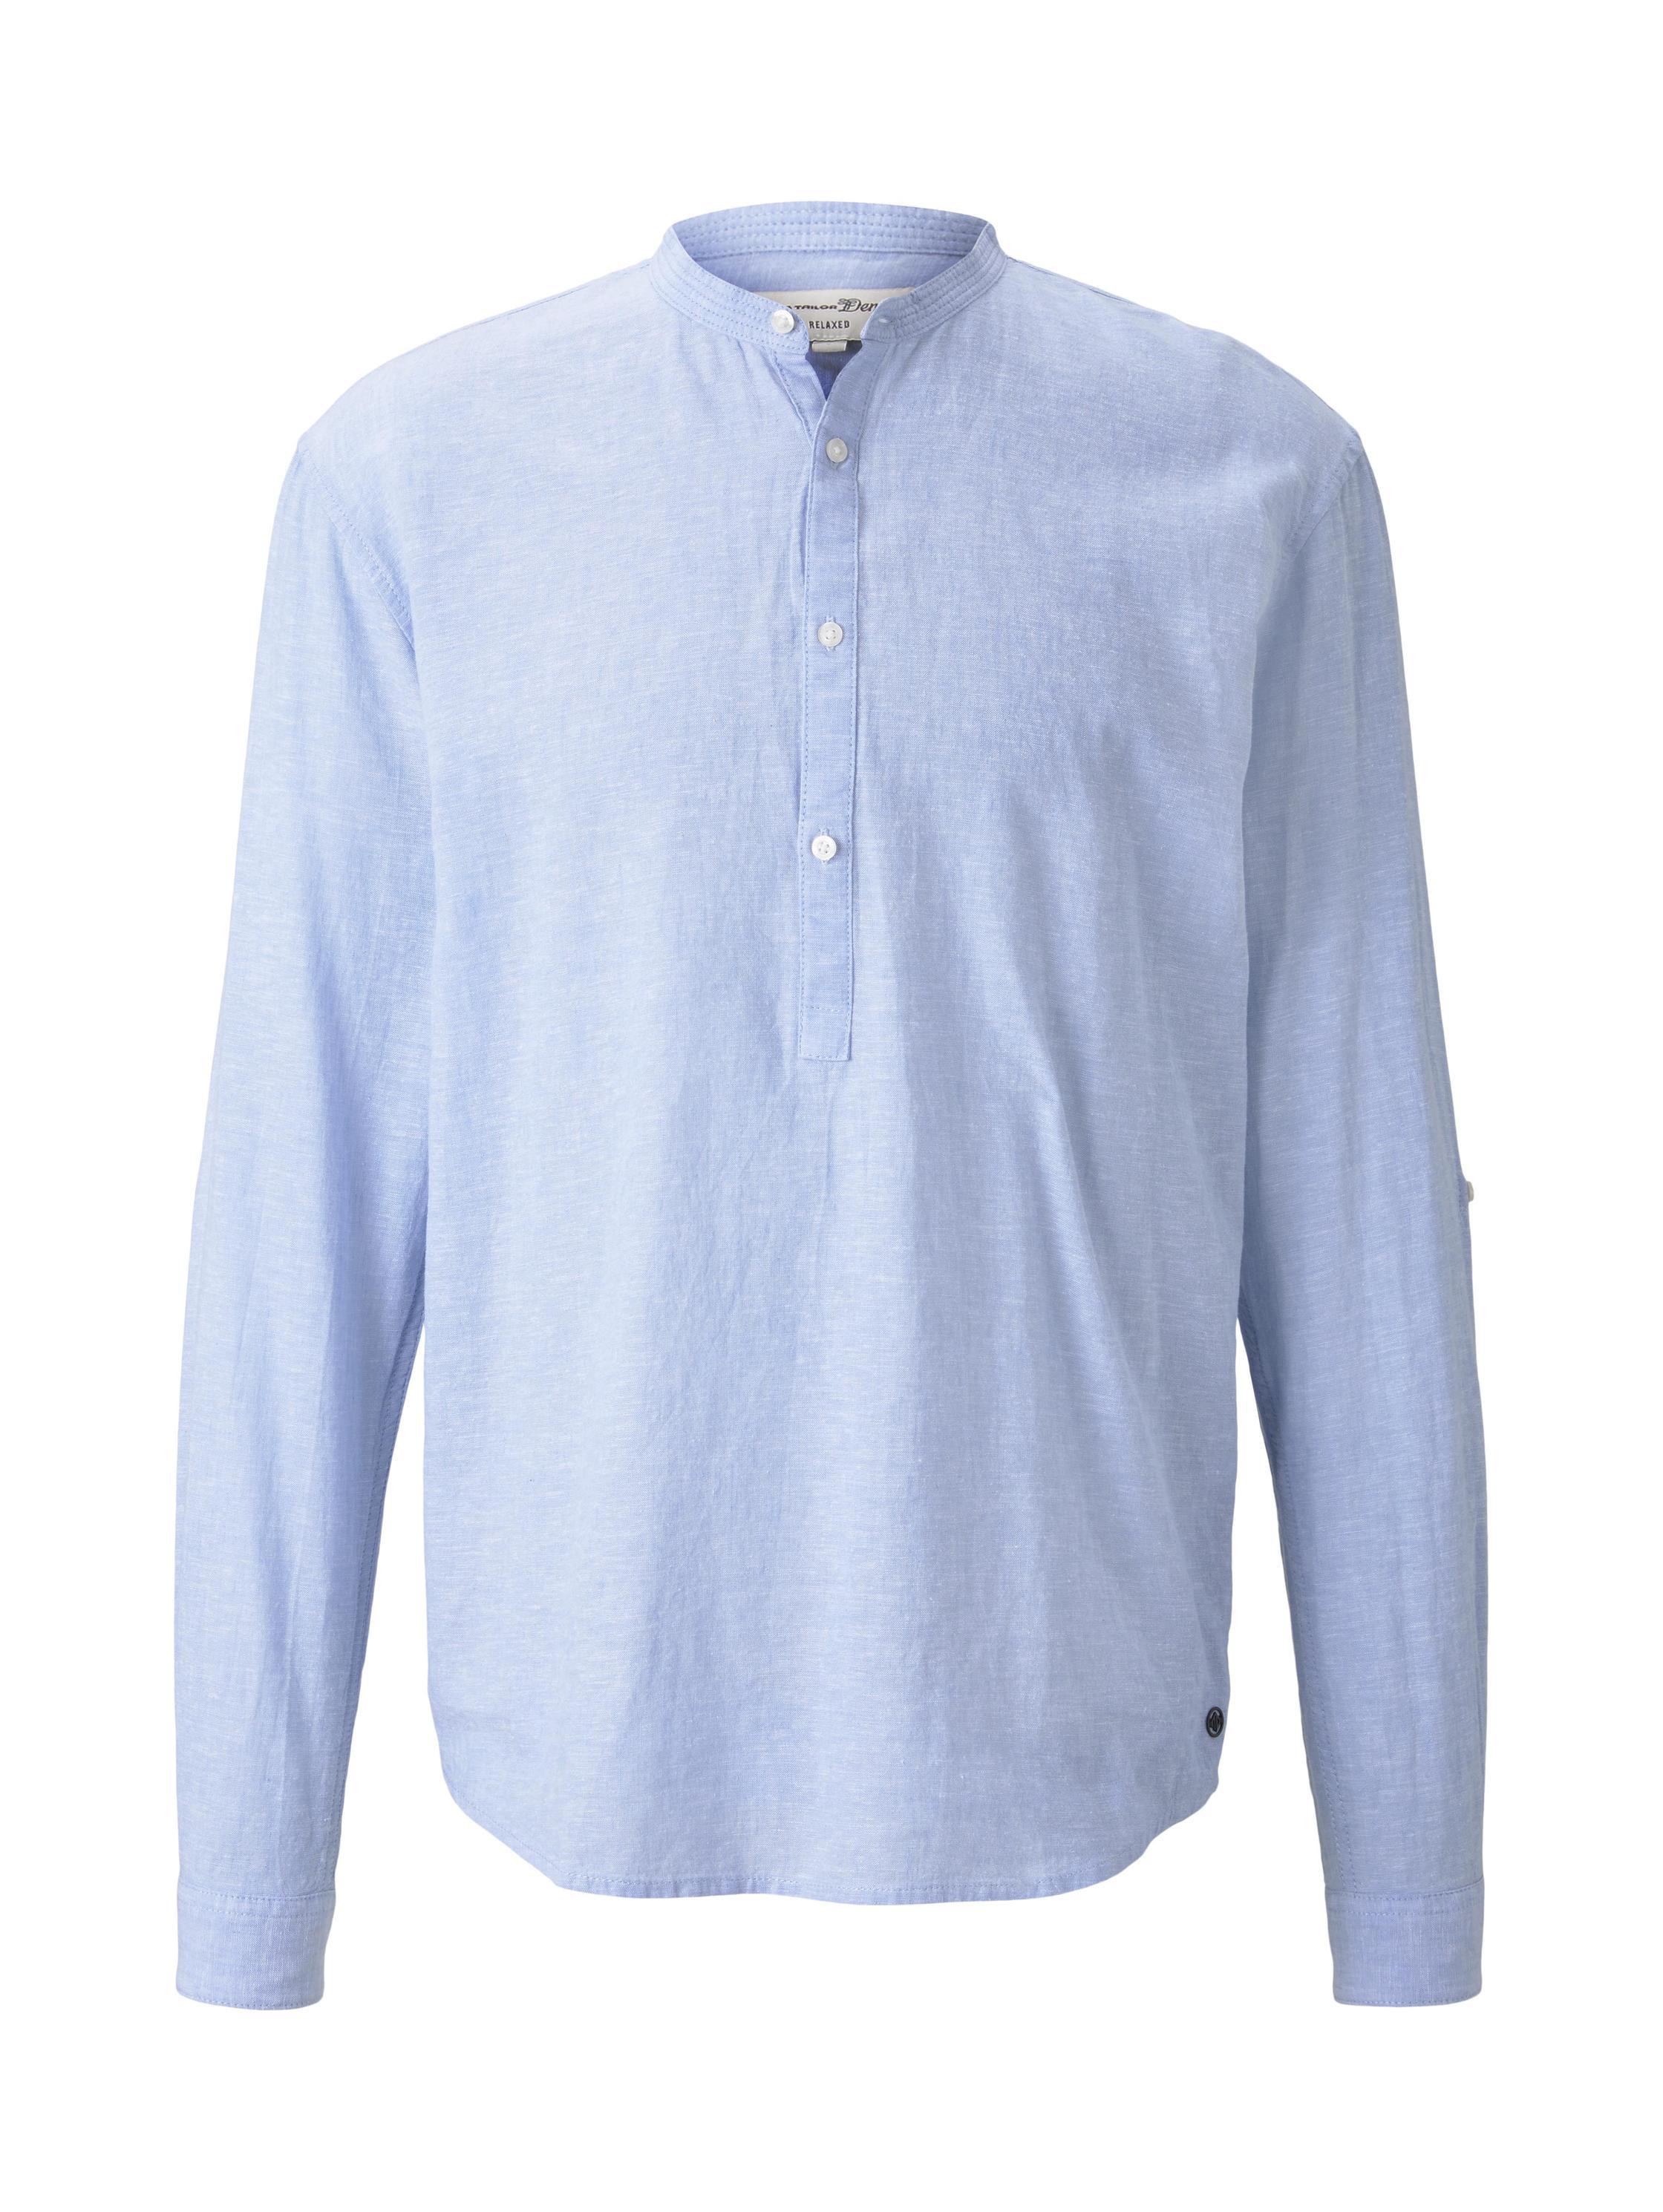 cotton linen mix tunic, Light Blue